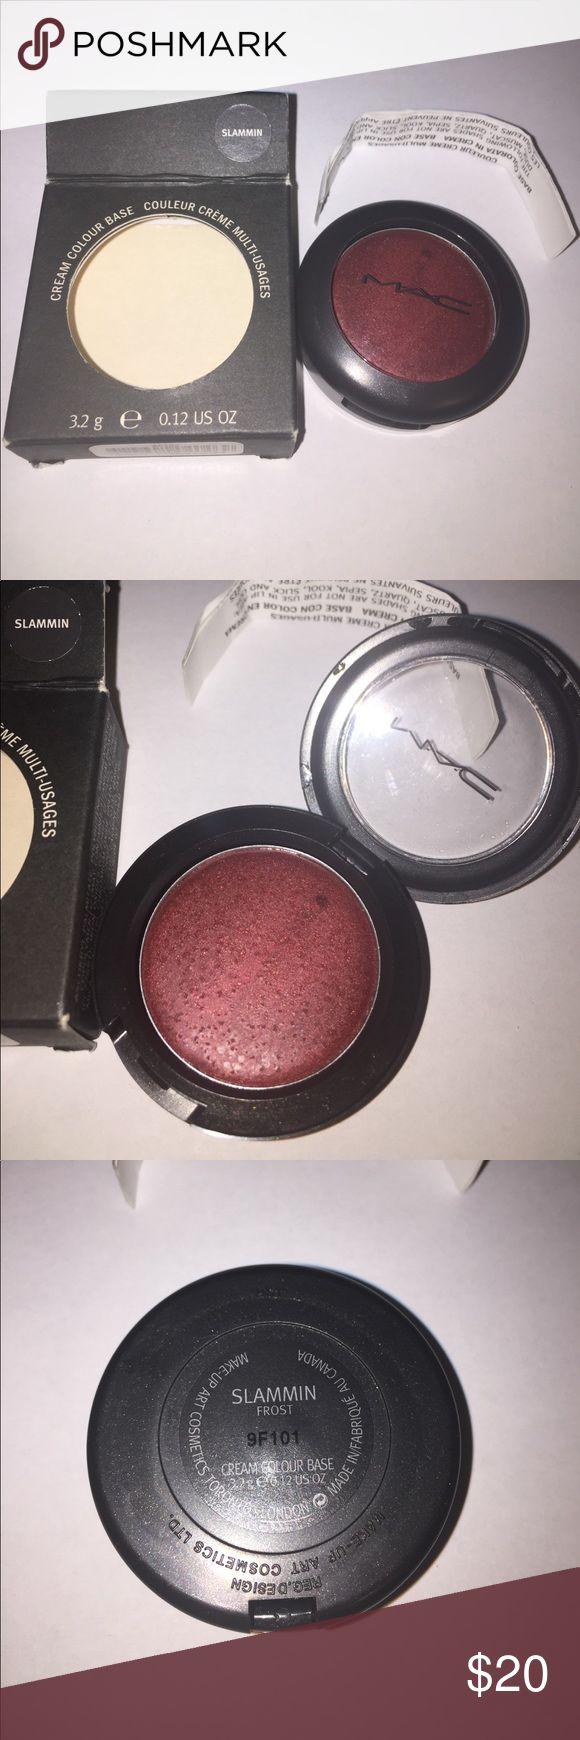 MAC COSMETICS BNIB SLAMMIN Cream Colour Base LE Firm Price. No trades. Thanks! MAC COSMETICS BNIB SLAMMIN Frost Cream Colour Base, very rare!!! Has a little moisture on top of product. CCB tend to attract moisture on top. Gorgeous very rare color. MAC Cosmetics Makeup Blush